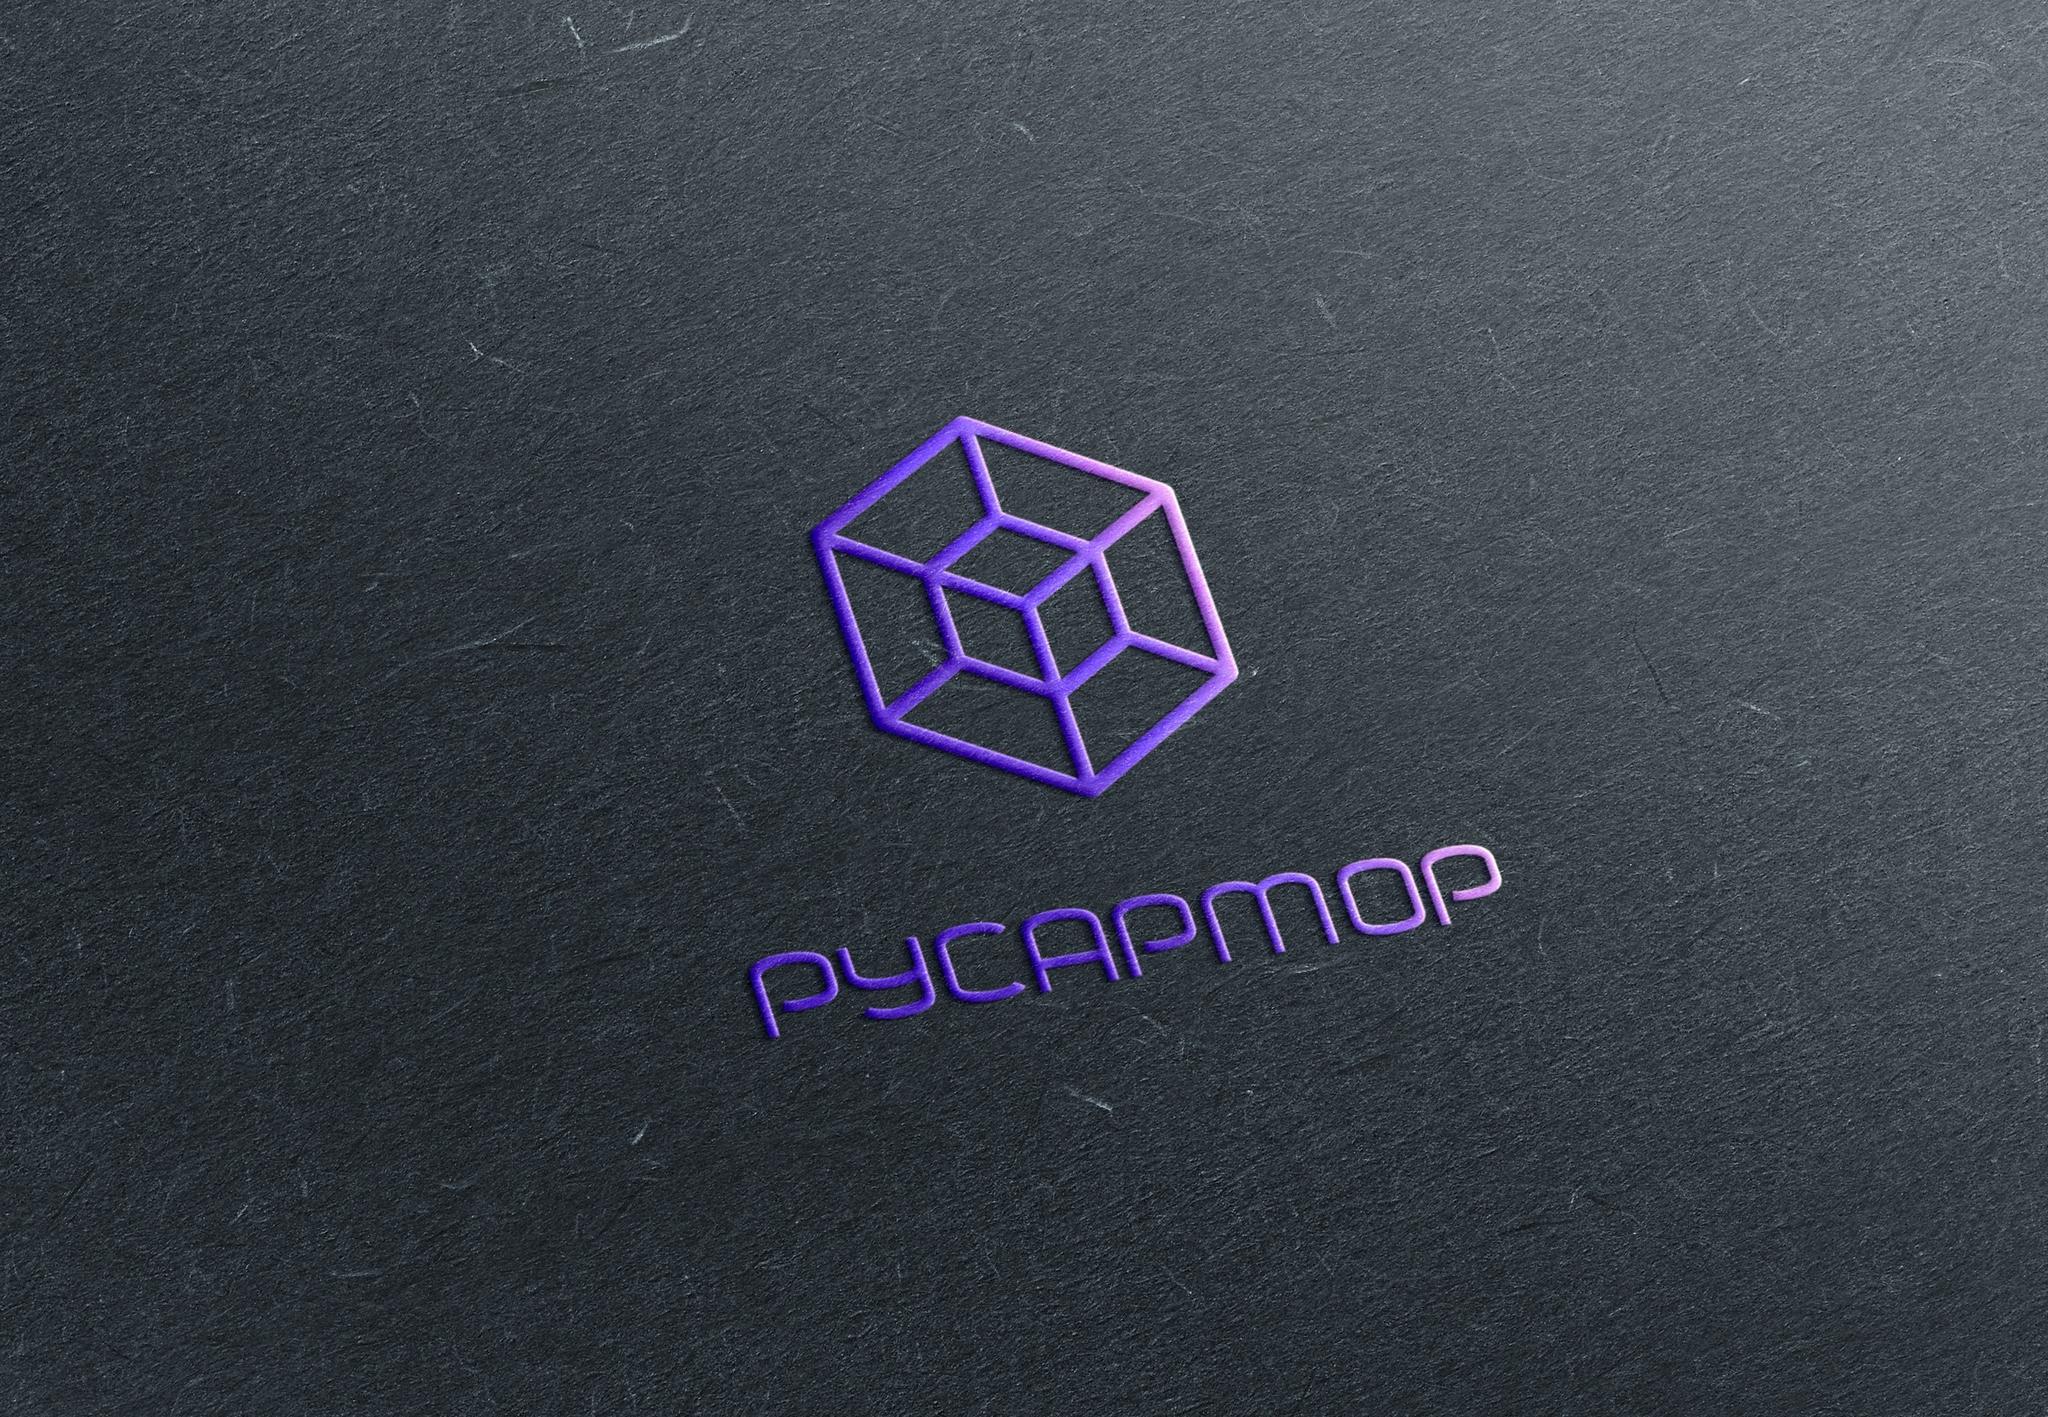 Разработка логотипа технологического стартапа РУСАРМОР фото f_0775a0813667f180.jpg